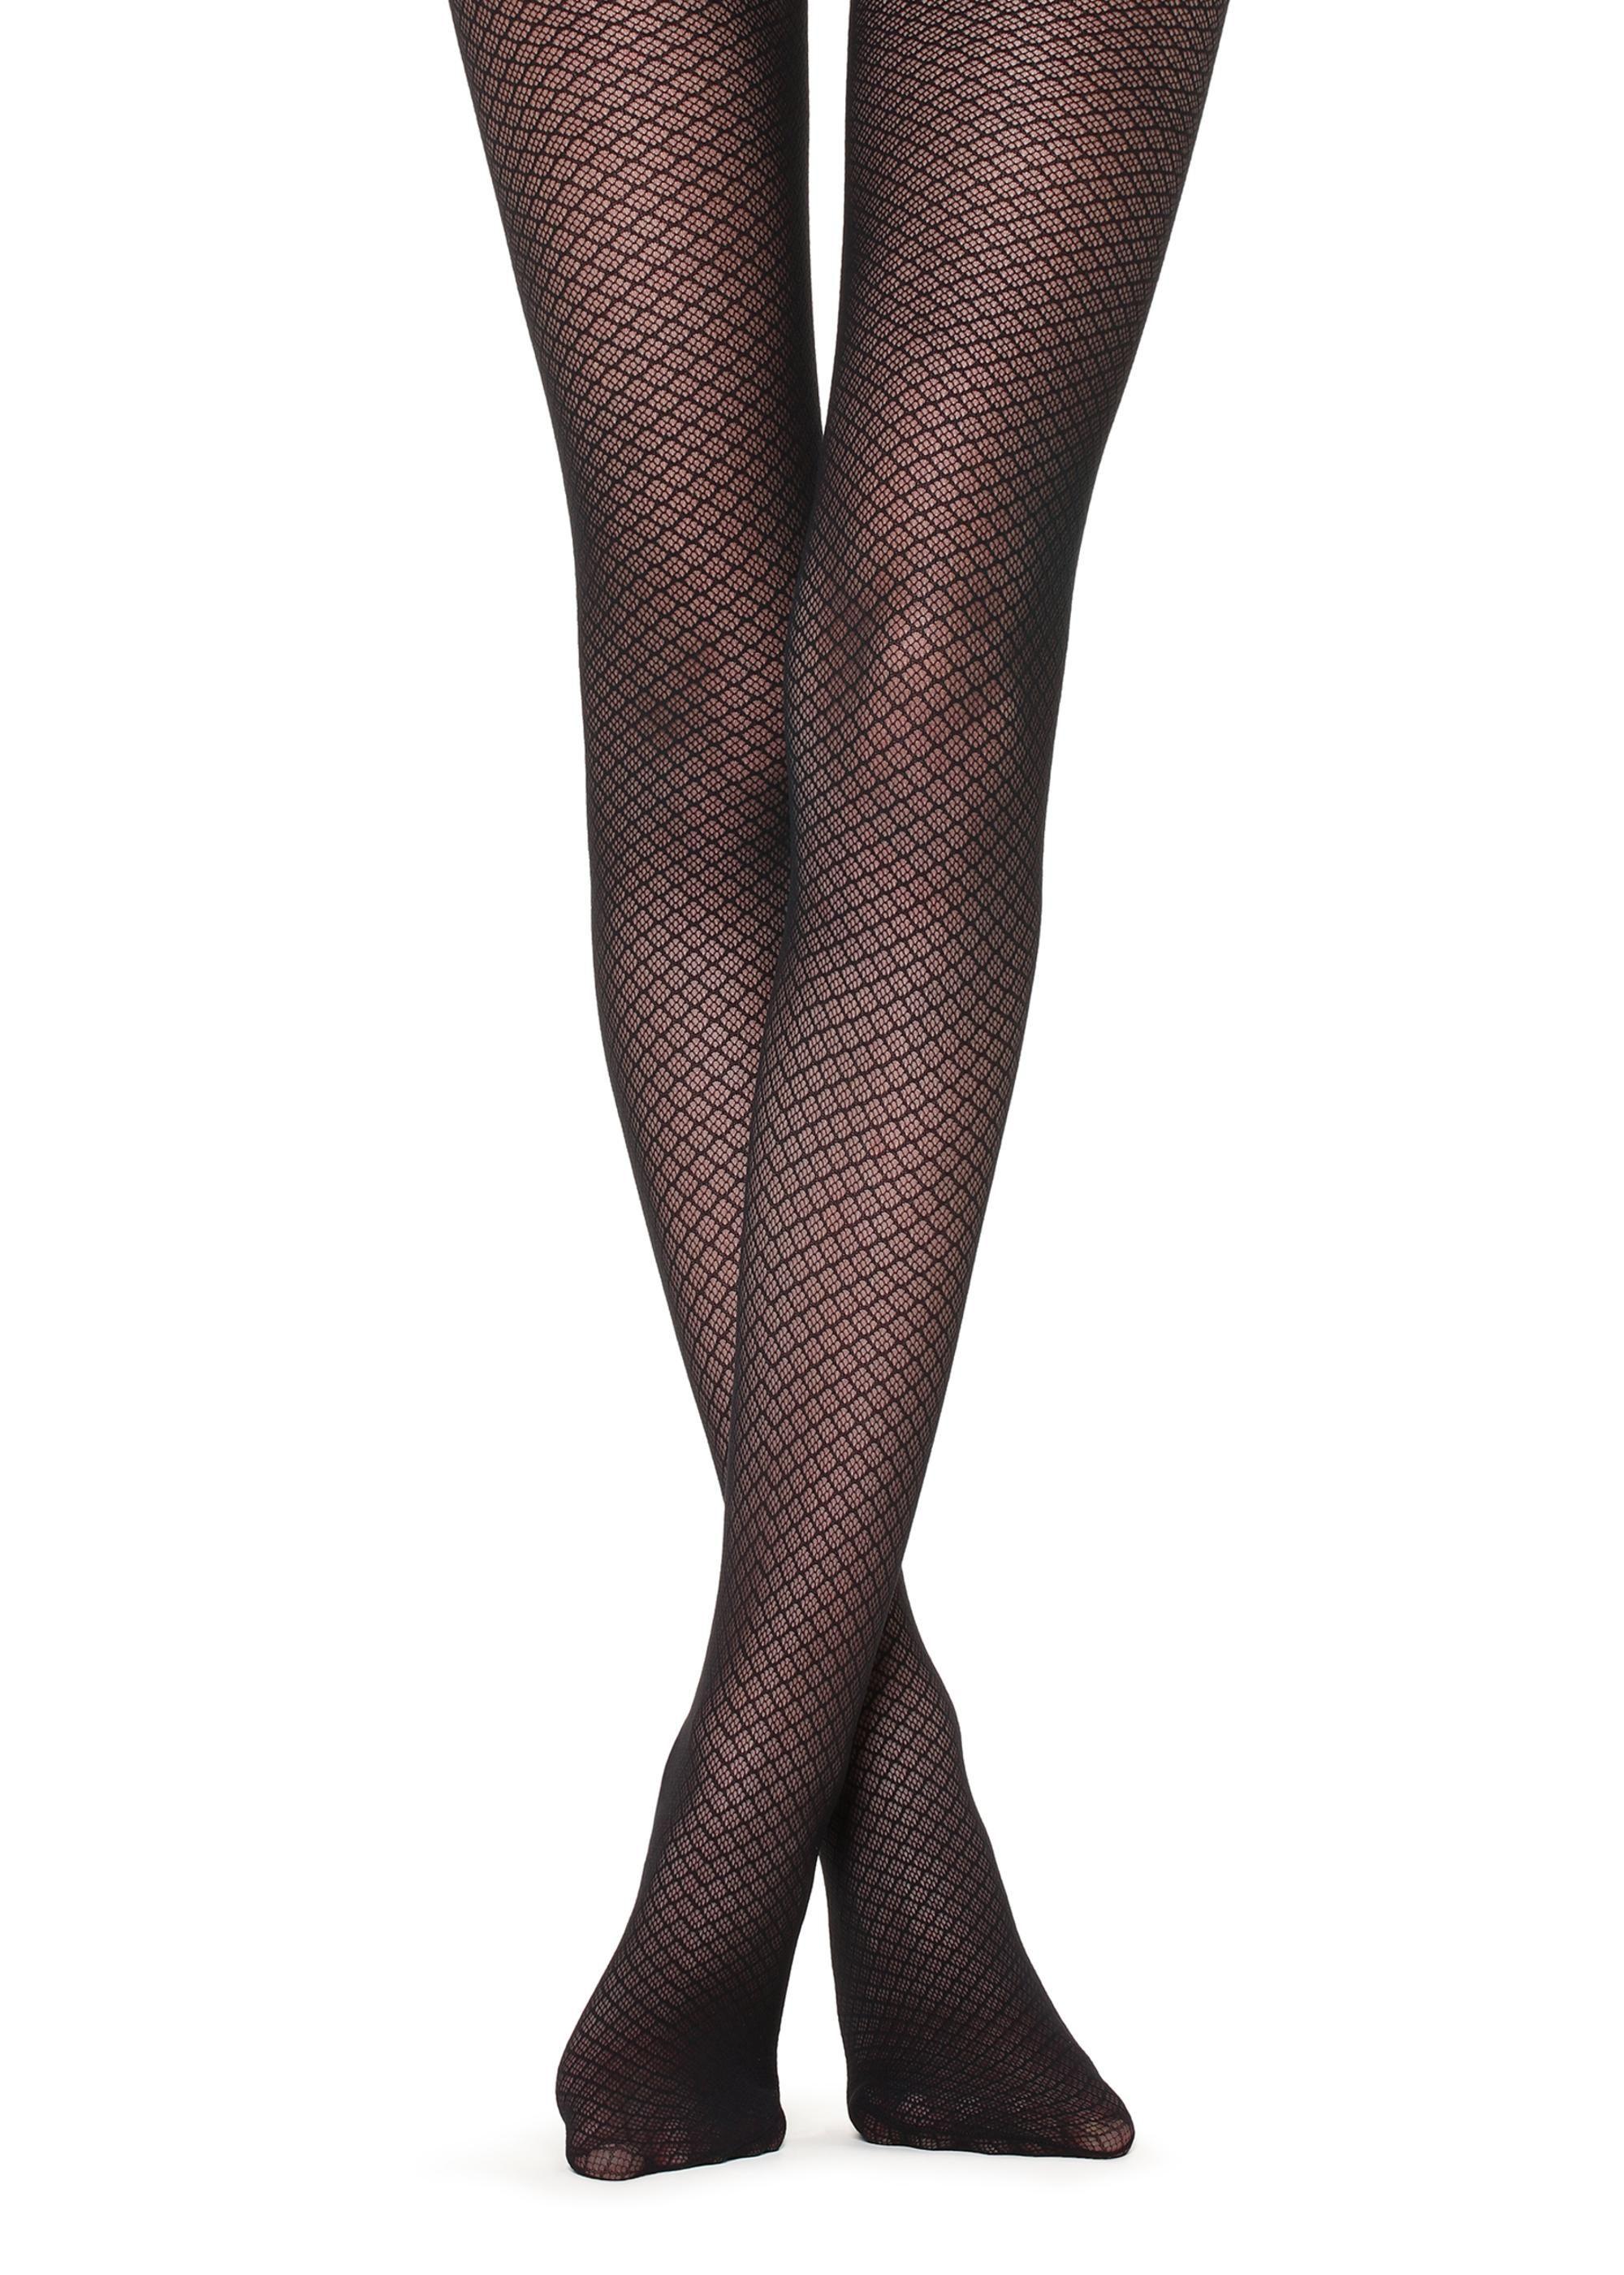 Patterned Fashion Tights Black Pantyhose